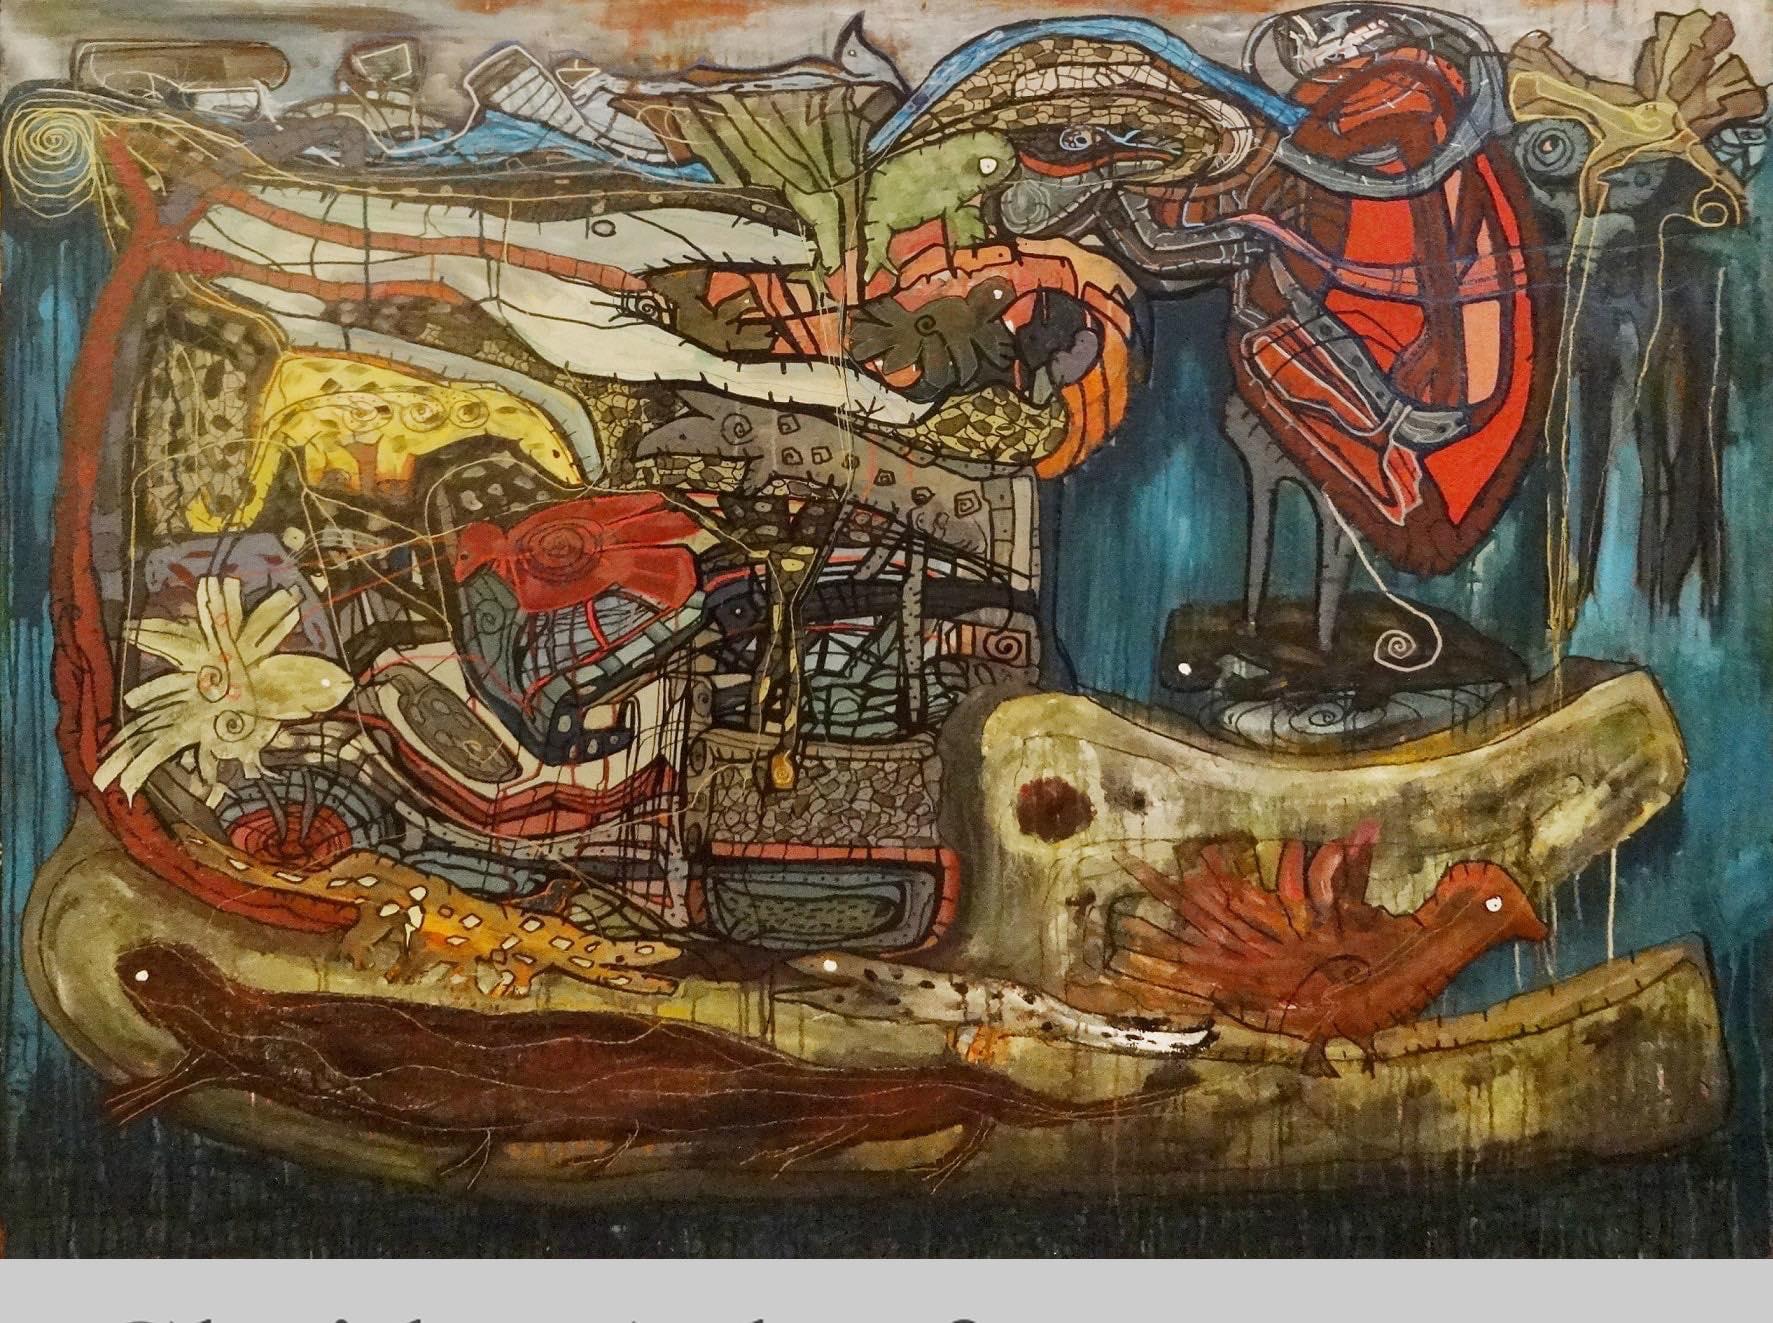 """Breakthrough"" Acrylic & Inks painting 55""x71"" inch by Ghaidaa Ashraf"